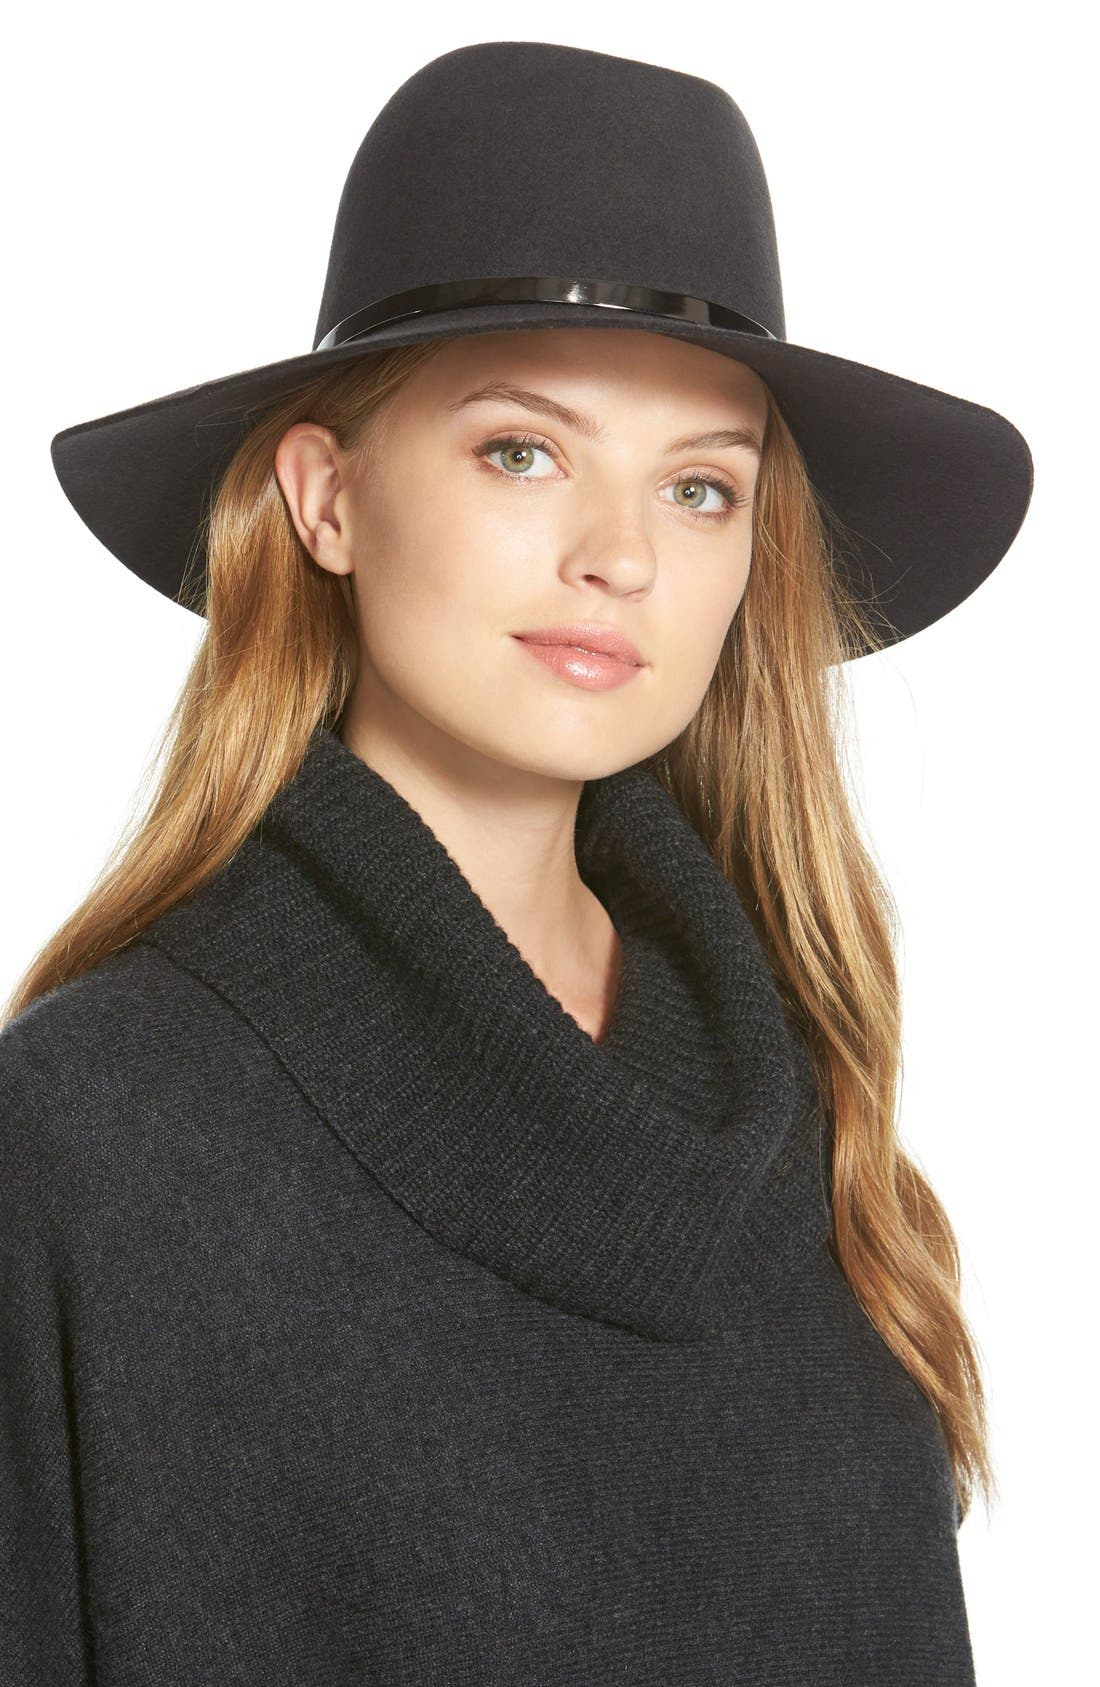 Alternate Image 1 Selected - Janessa Leone 'Slate' Floppy Wool Felt Hat